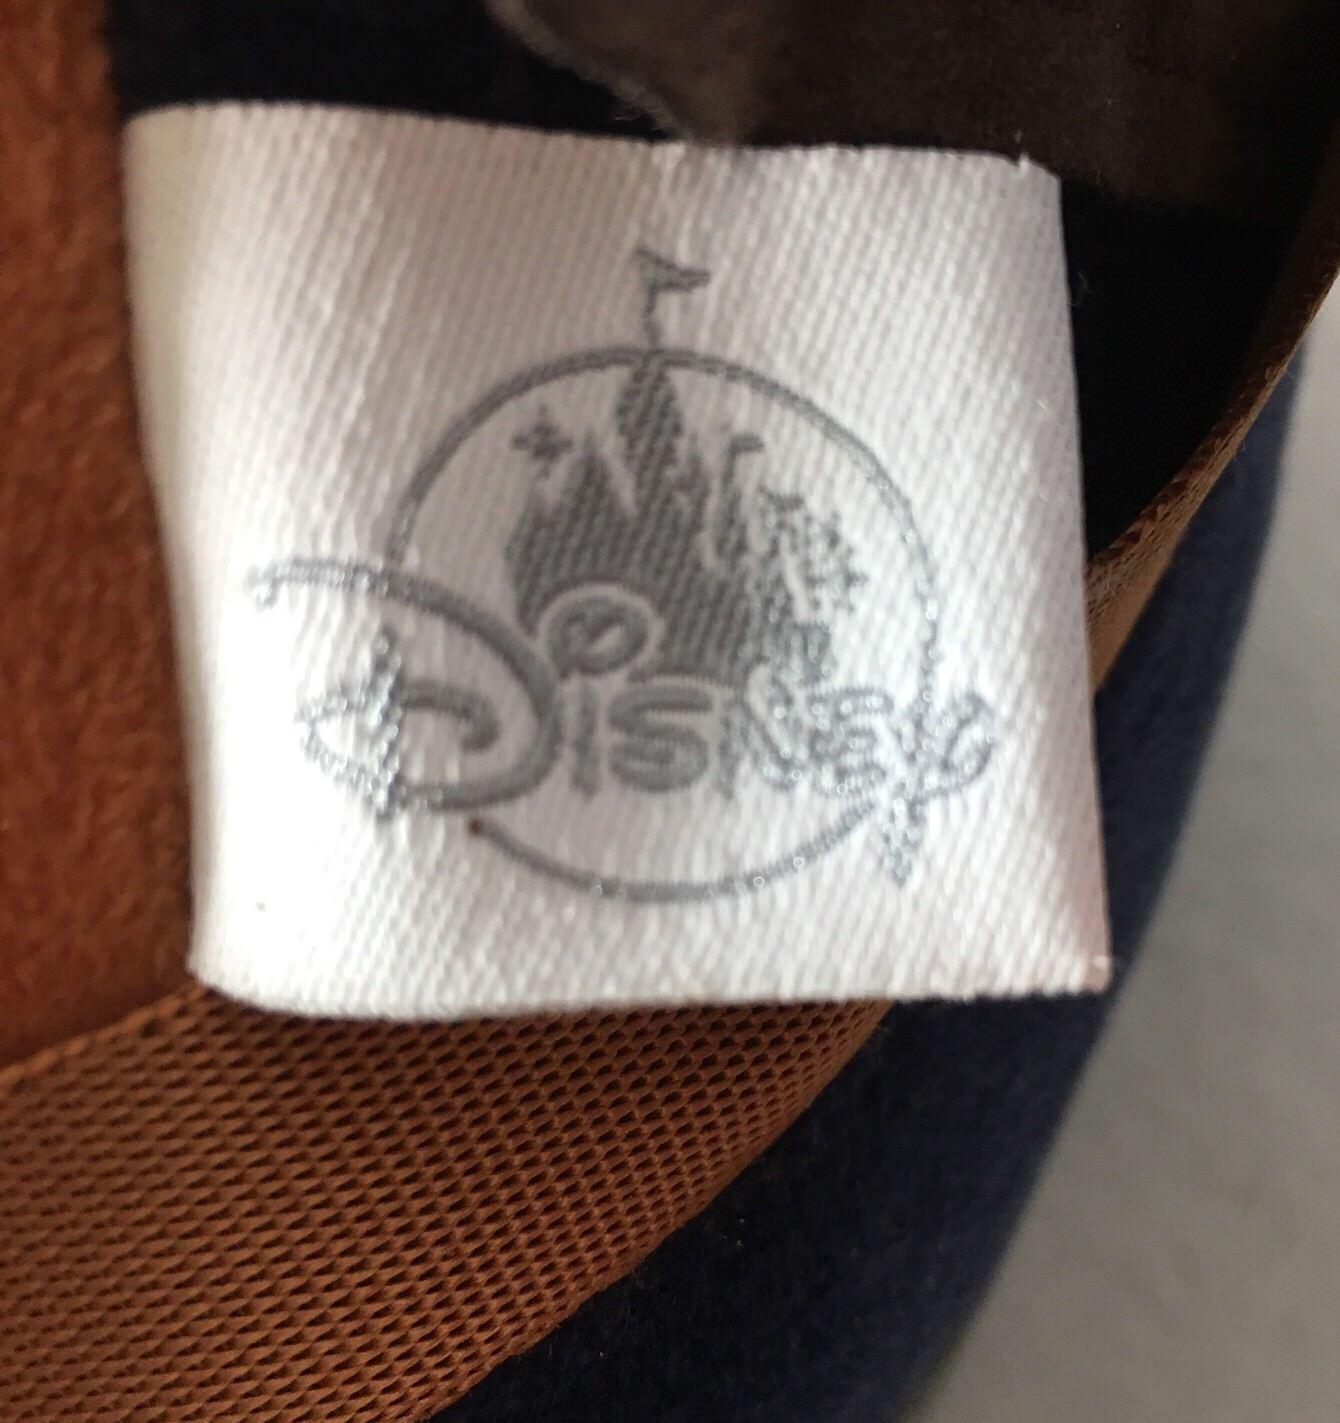 Disney Store Dr Jumba Jookiba Plush From Lilo & Stitch 13 Inch Mad Scientist image 8